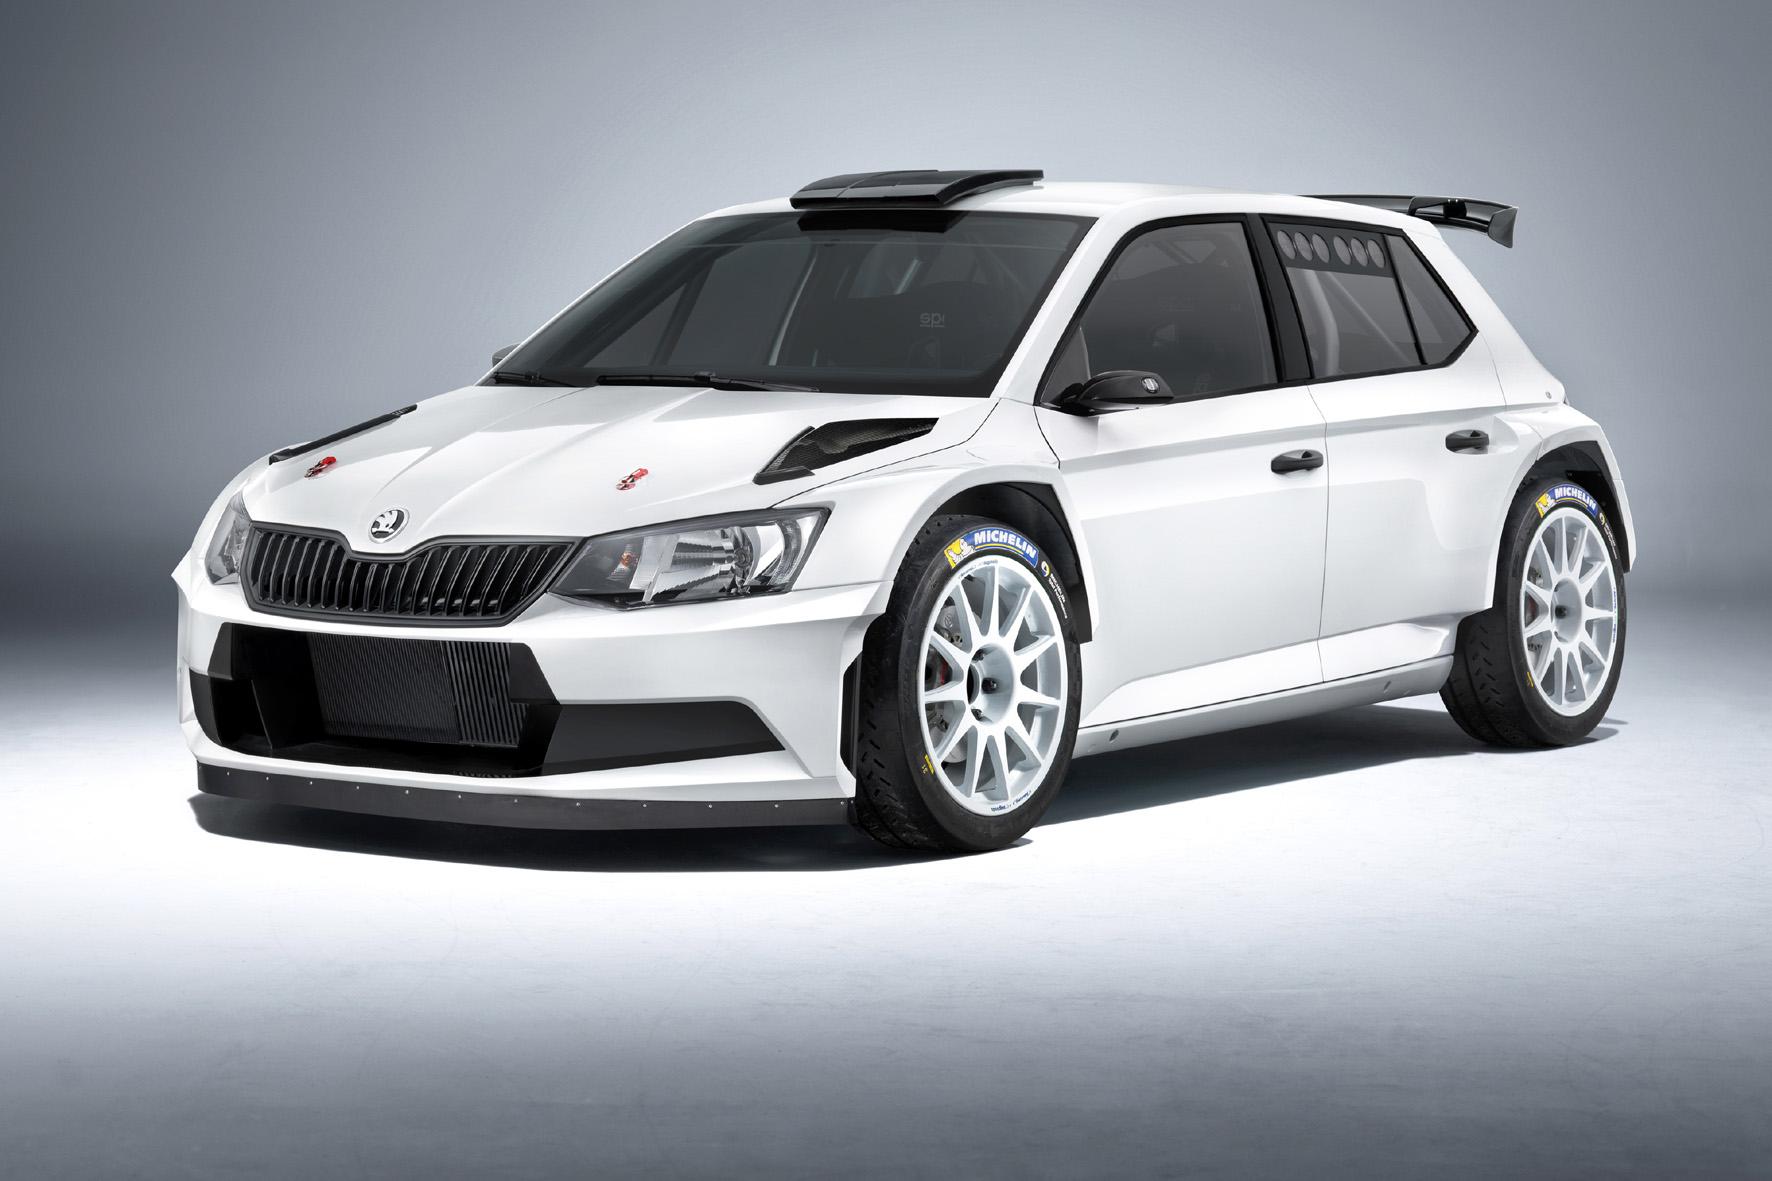 Skoda Fabia R 5 darf auf die Rallye-Piste